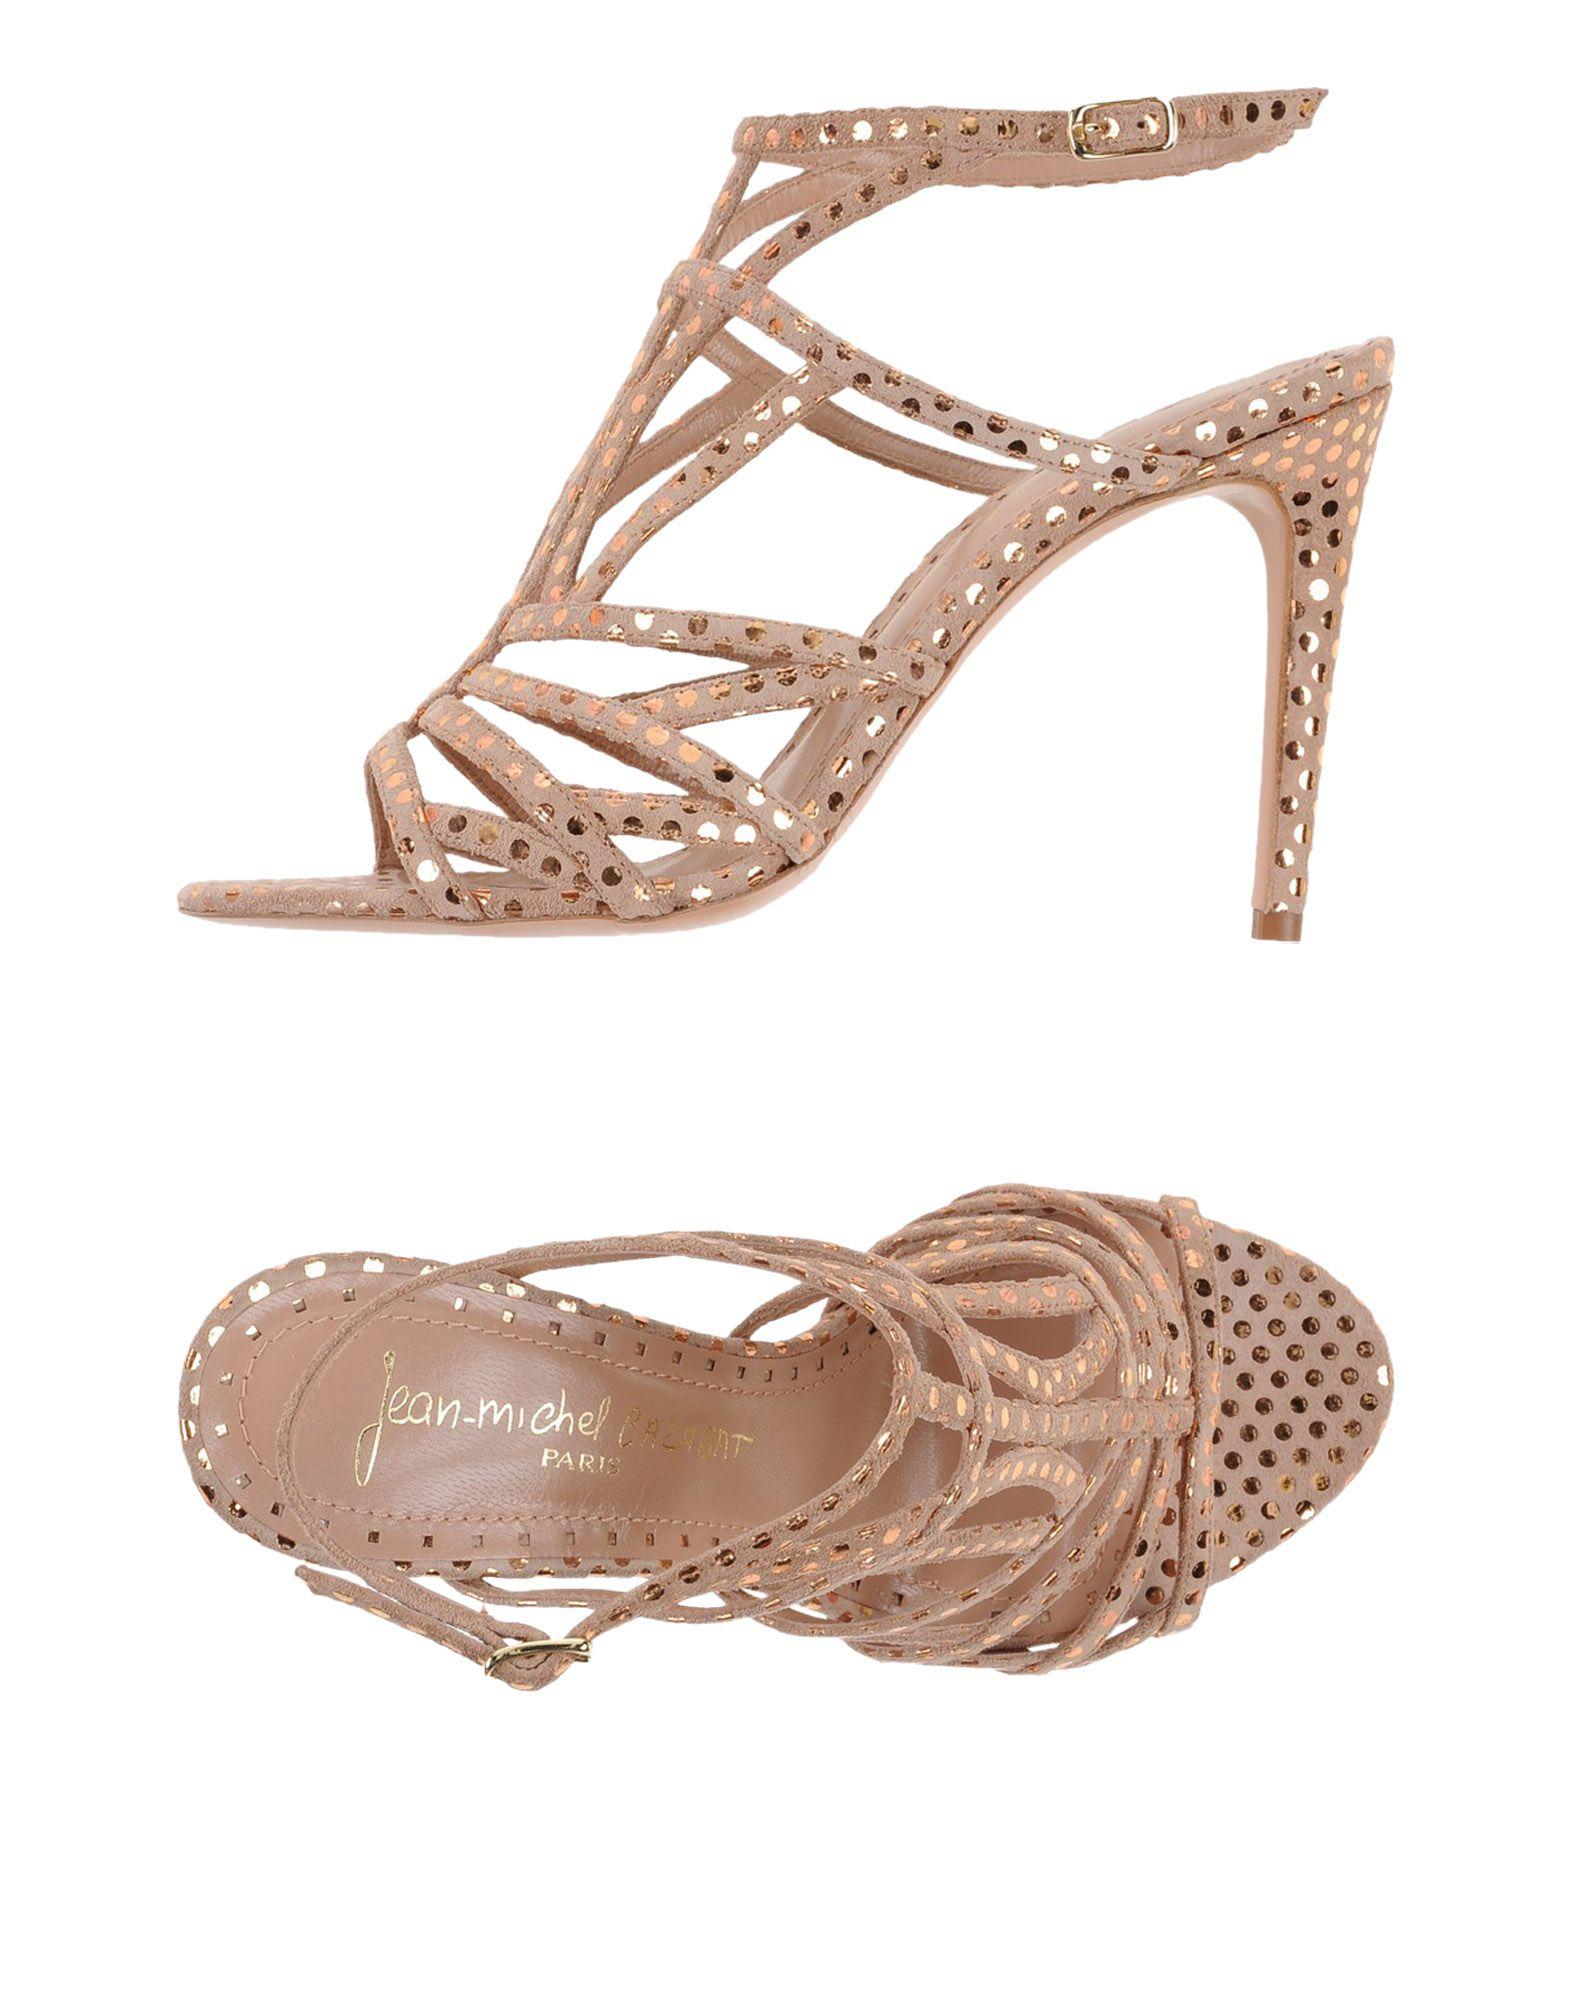 JEAN-MICHEL CAZABAT Sandals in Pale Pink